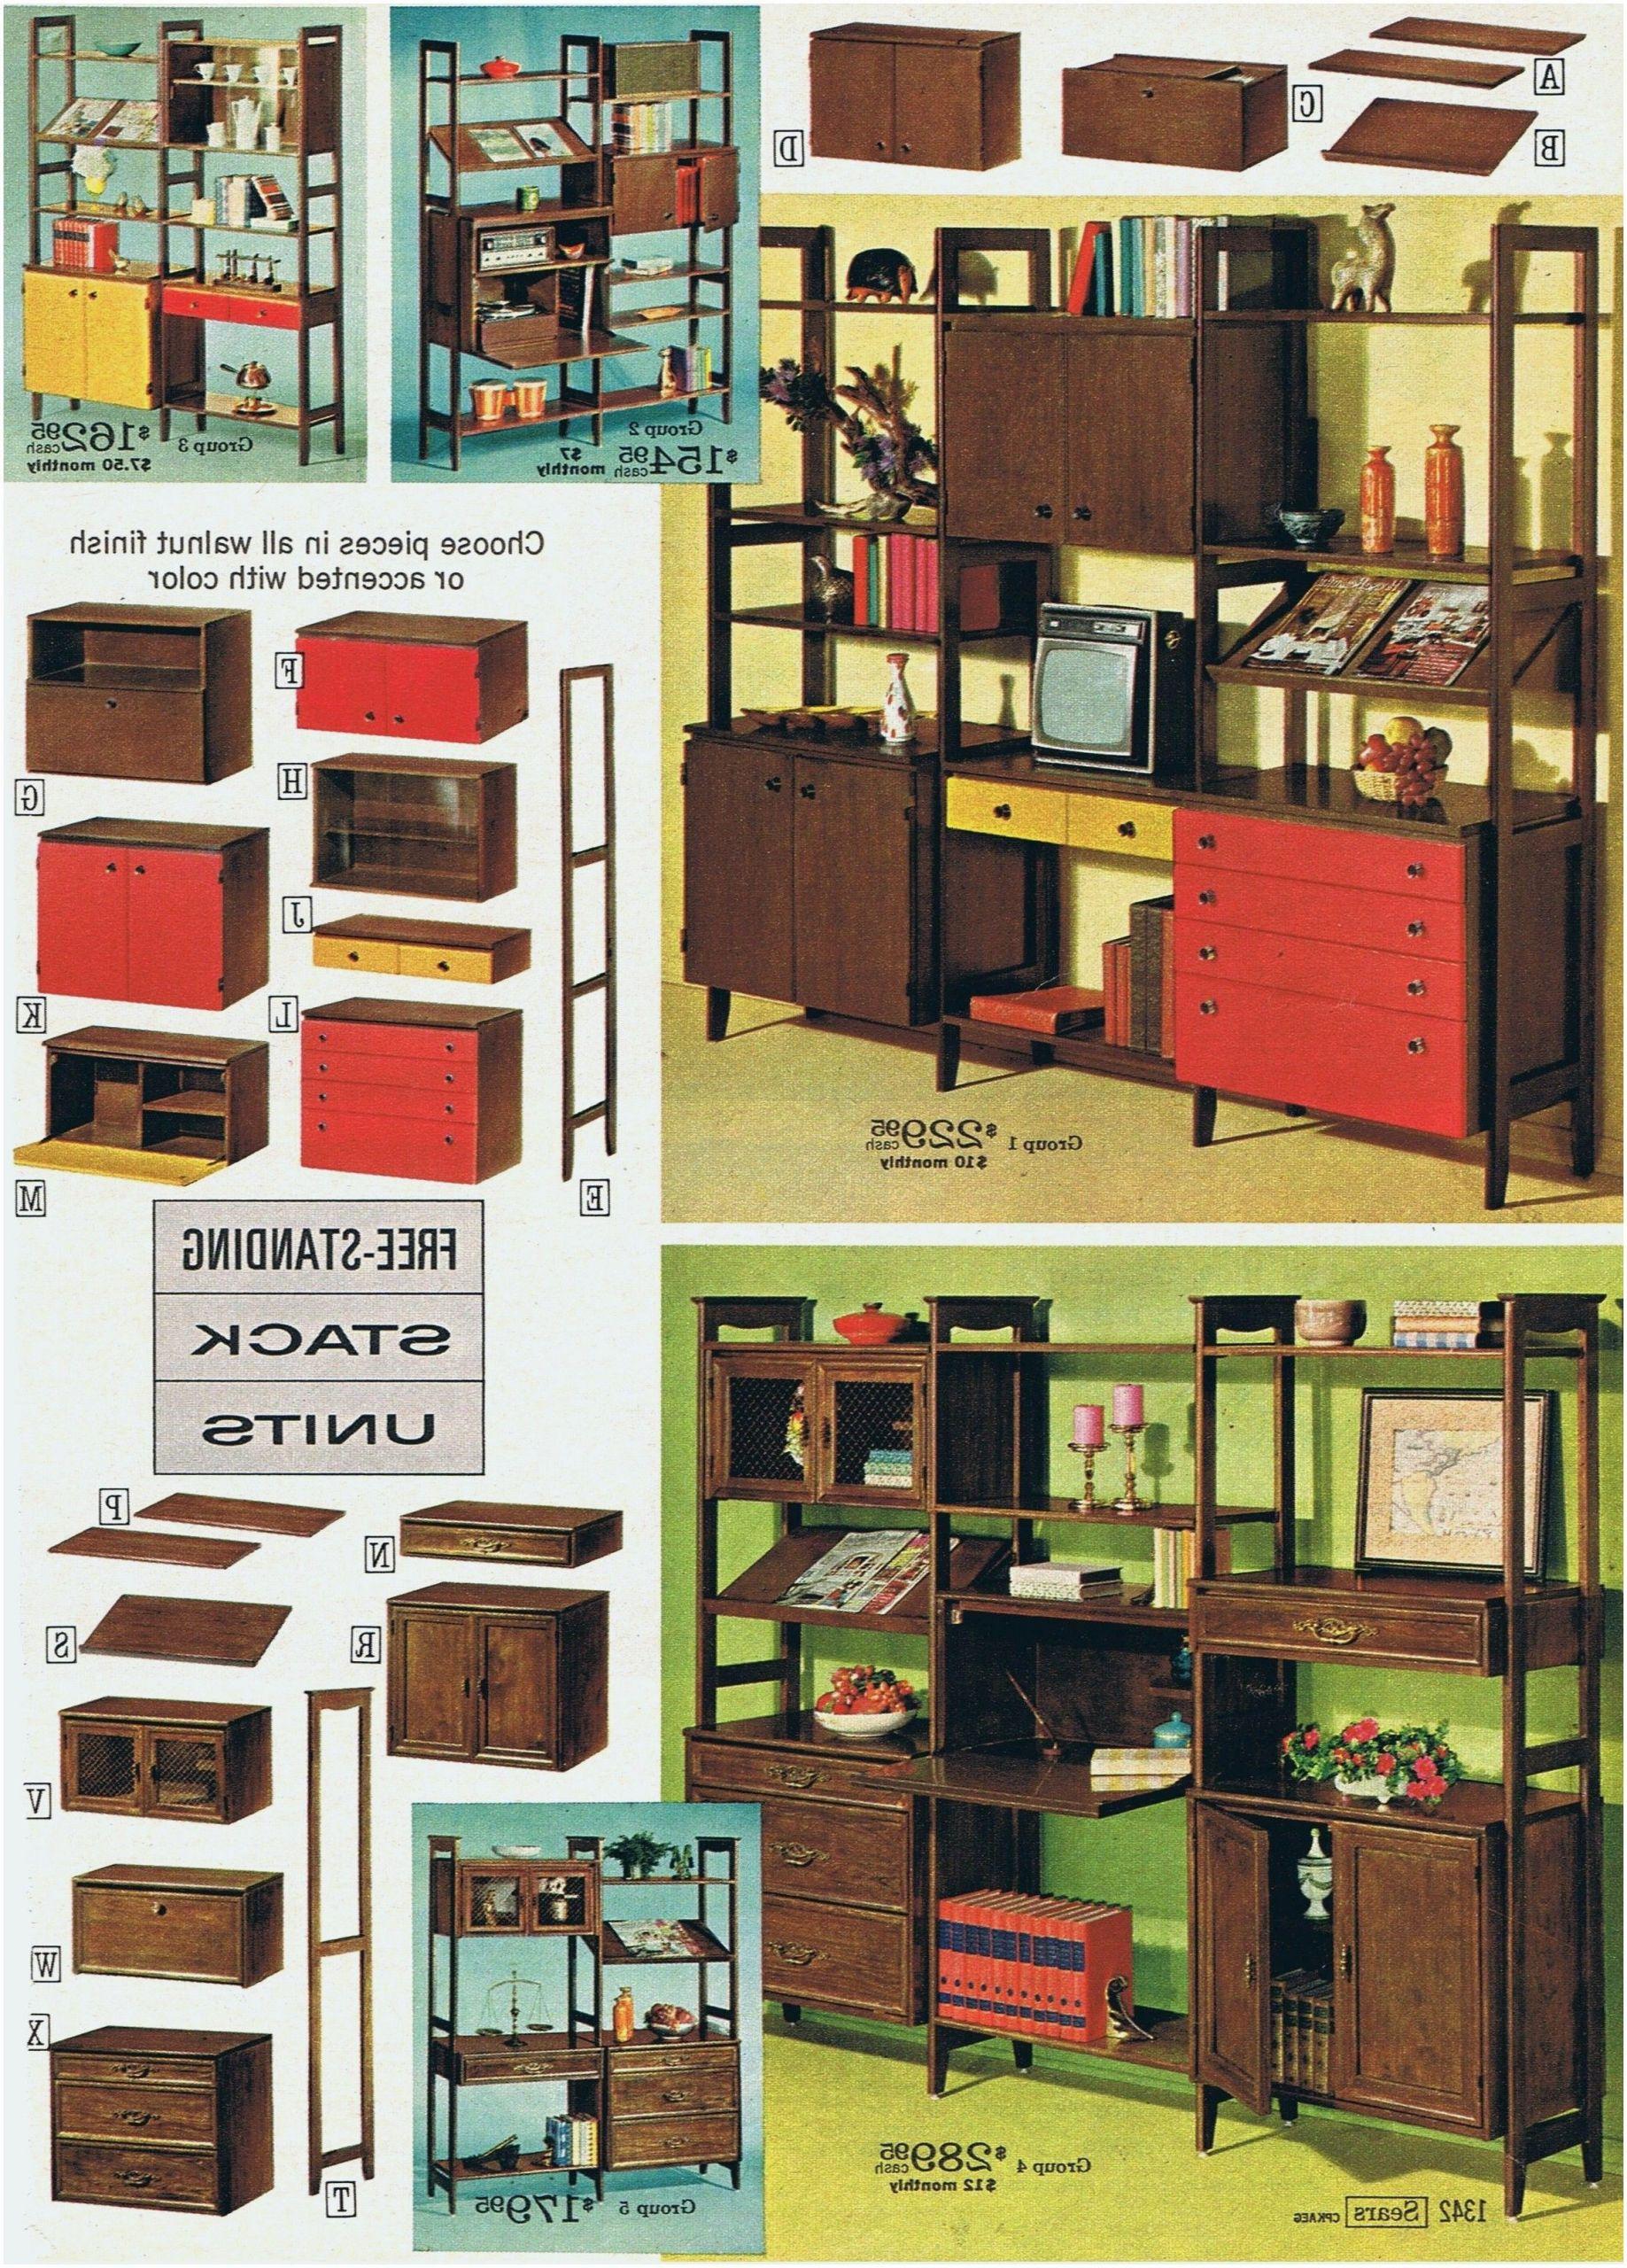 magasin de meuble pau meubles pau of magasin de meuble pau